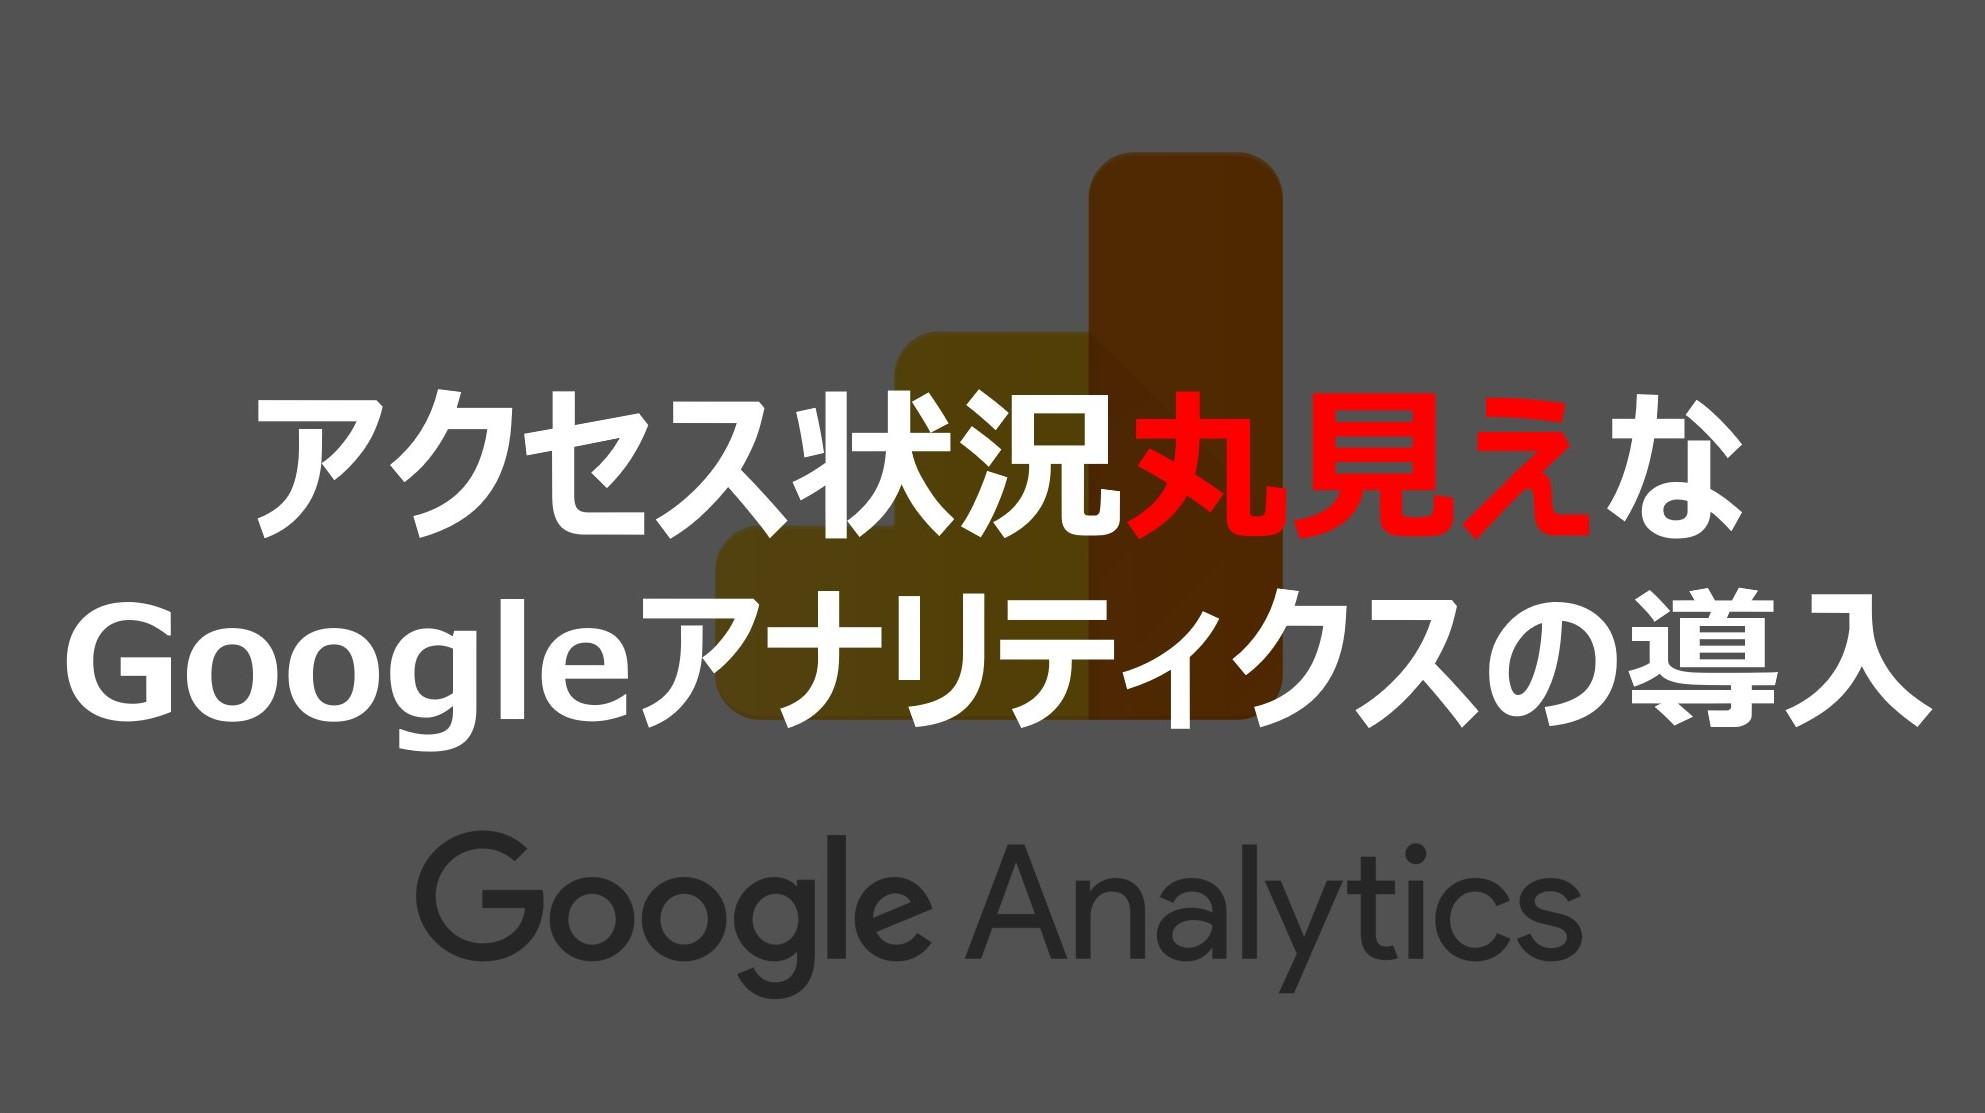 Googleアナリティクス導入をわかりやすく解説!